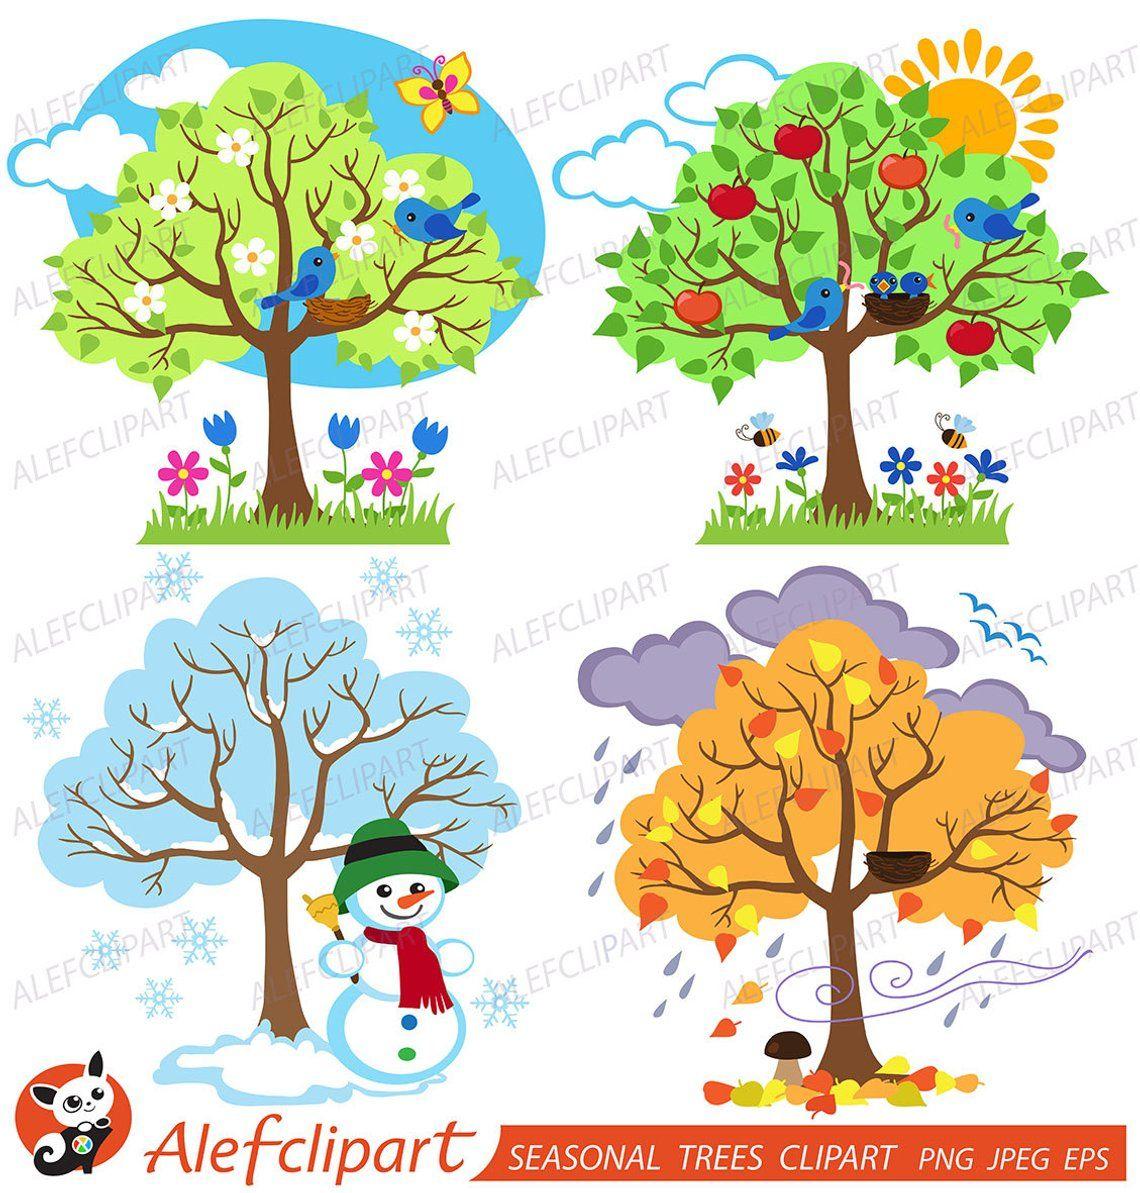 Clipart trees school. Four seasons seasonal and